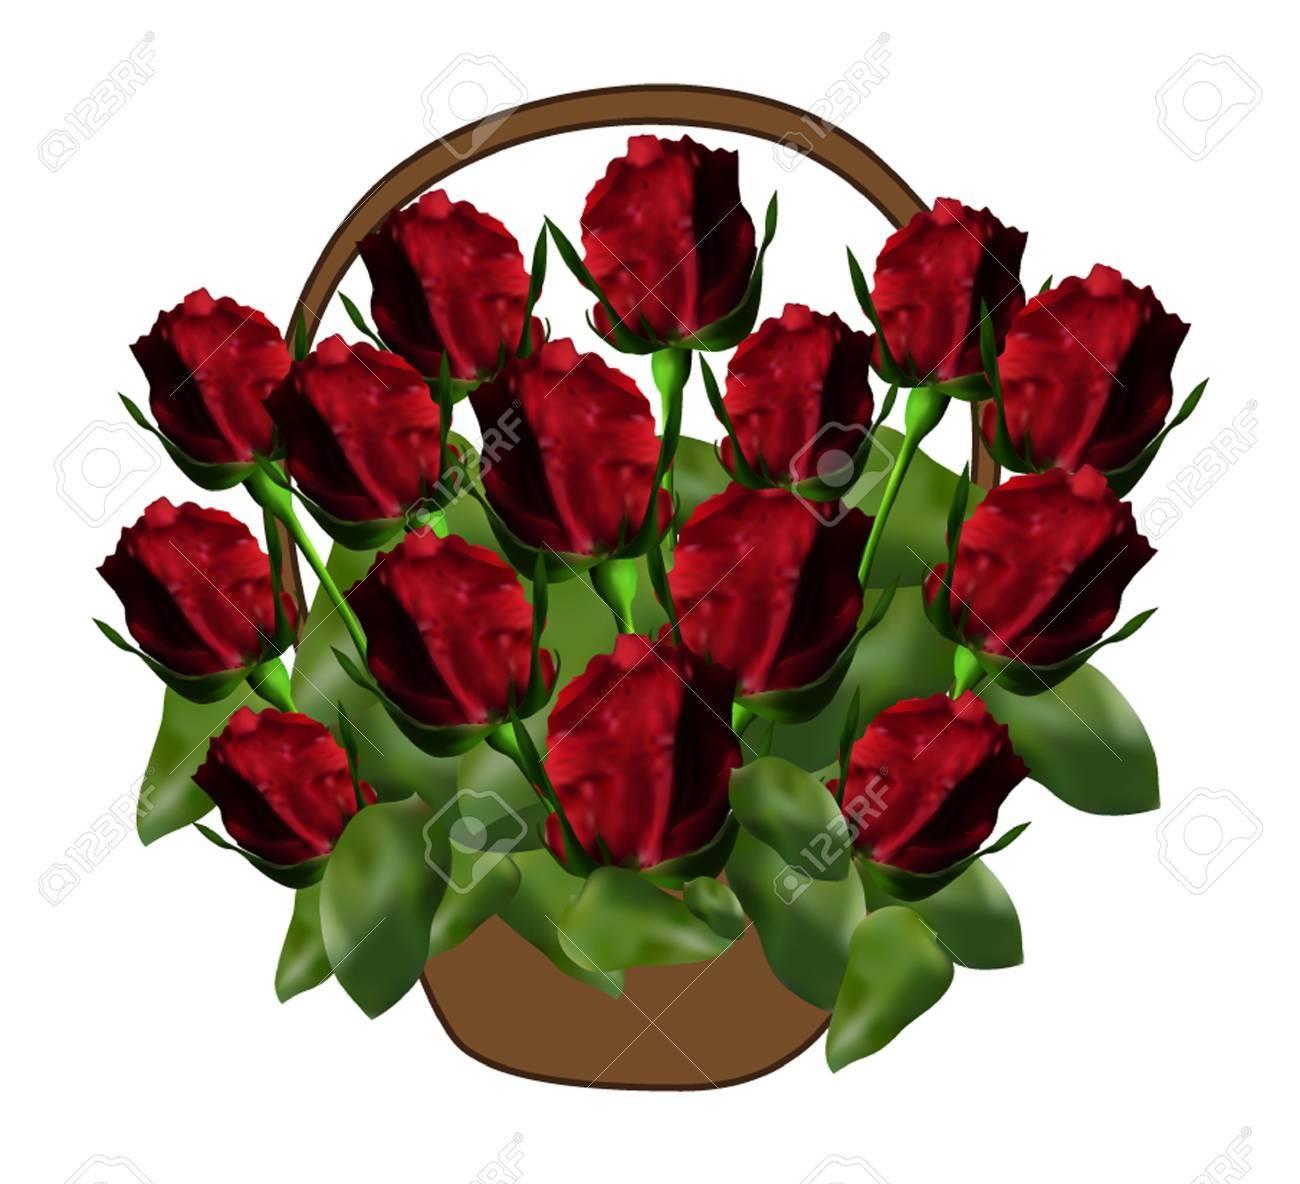 Basket with elegant red roses symbol of love royalty free basket with elegant red roses symbol of love stock vector 15695005 buycottarizona